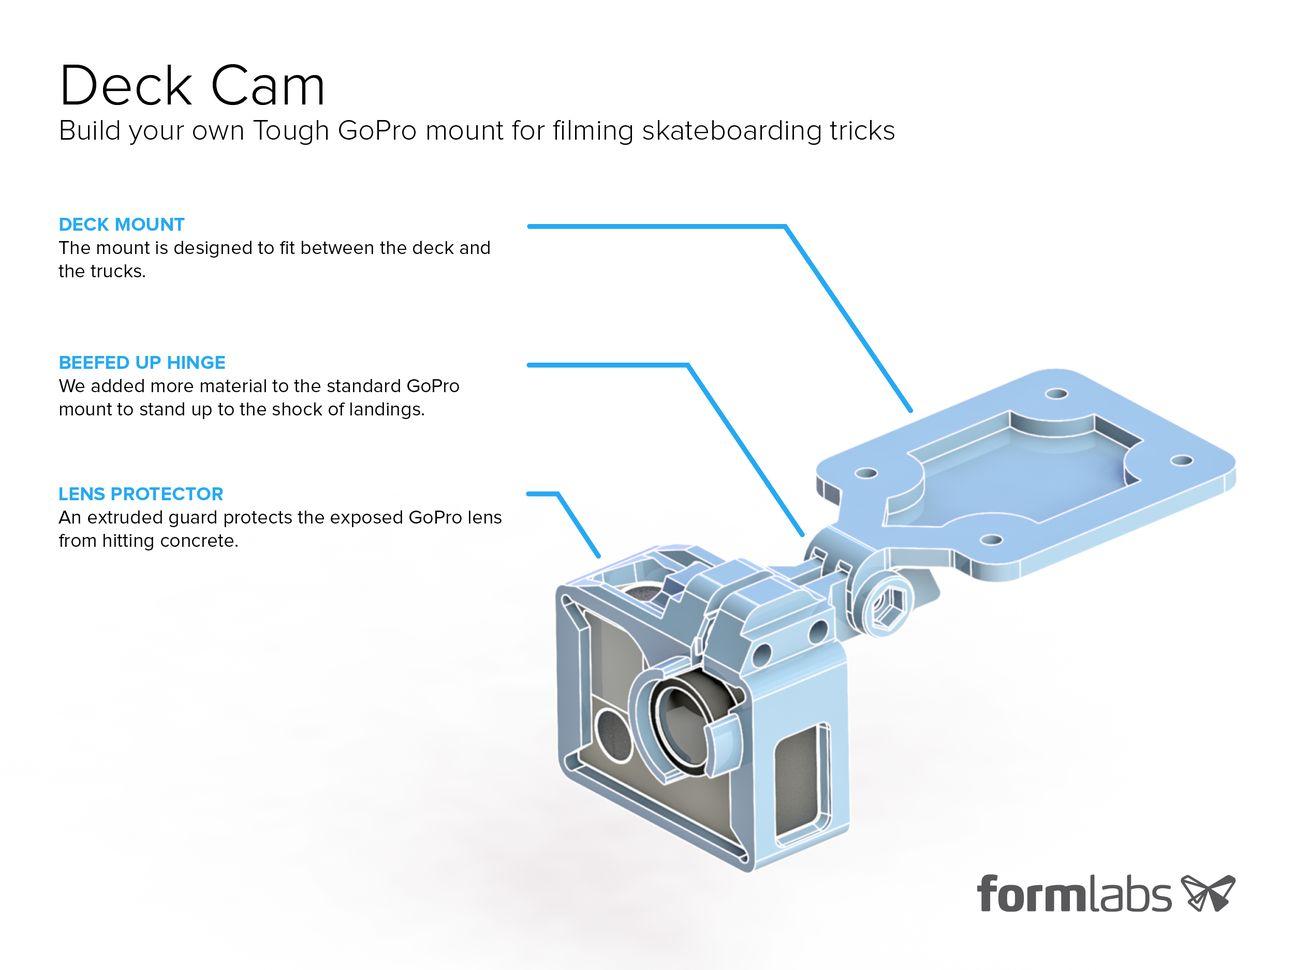 3d-printed-deck-cam-tough-mount.png.1294x0_q80_crop-smart